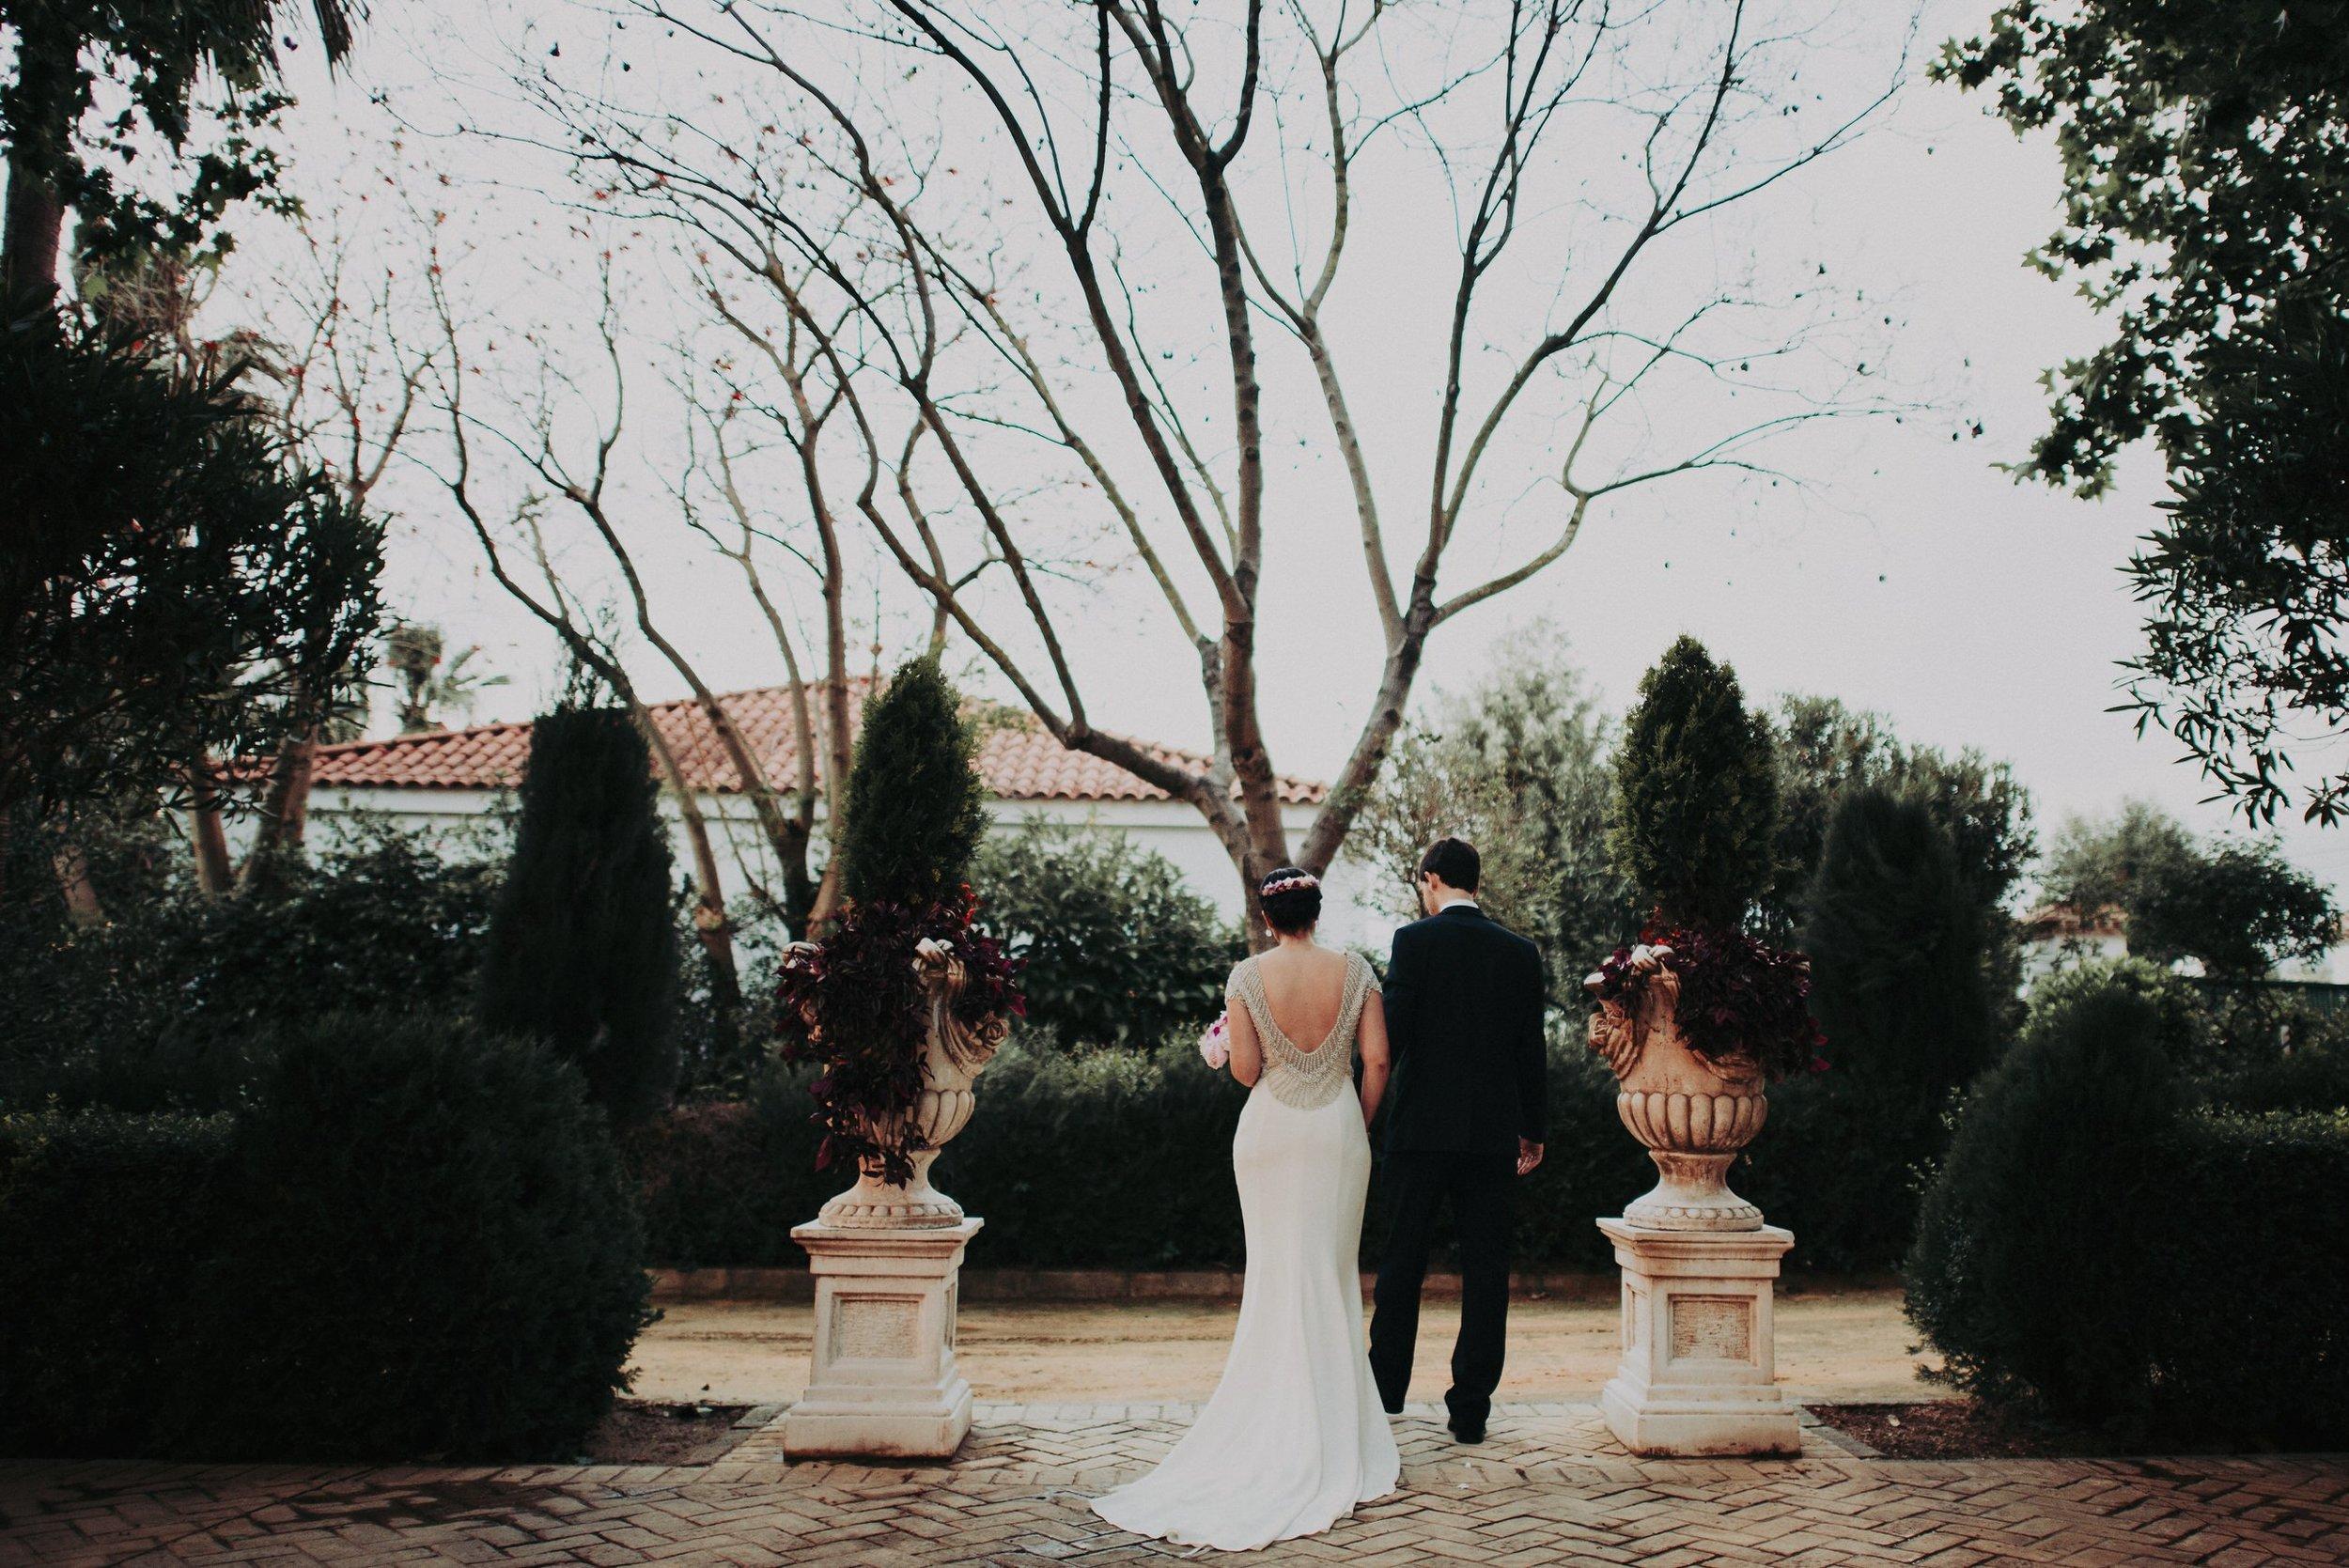 Laura & Rubén - boda en utrera - Santa clotilde- Manolo mayo - Fotografo de boda - Andrés Amarillo AAA_1075-Exposure (33).jpg